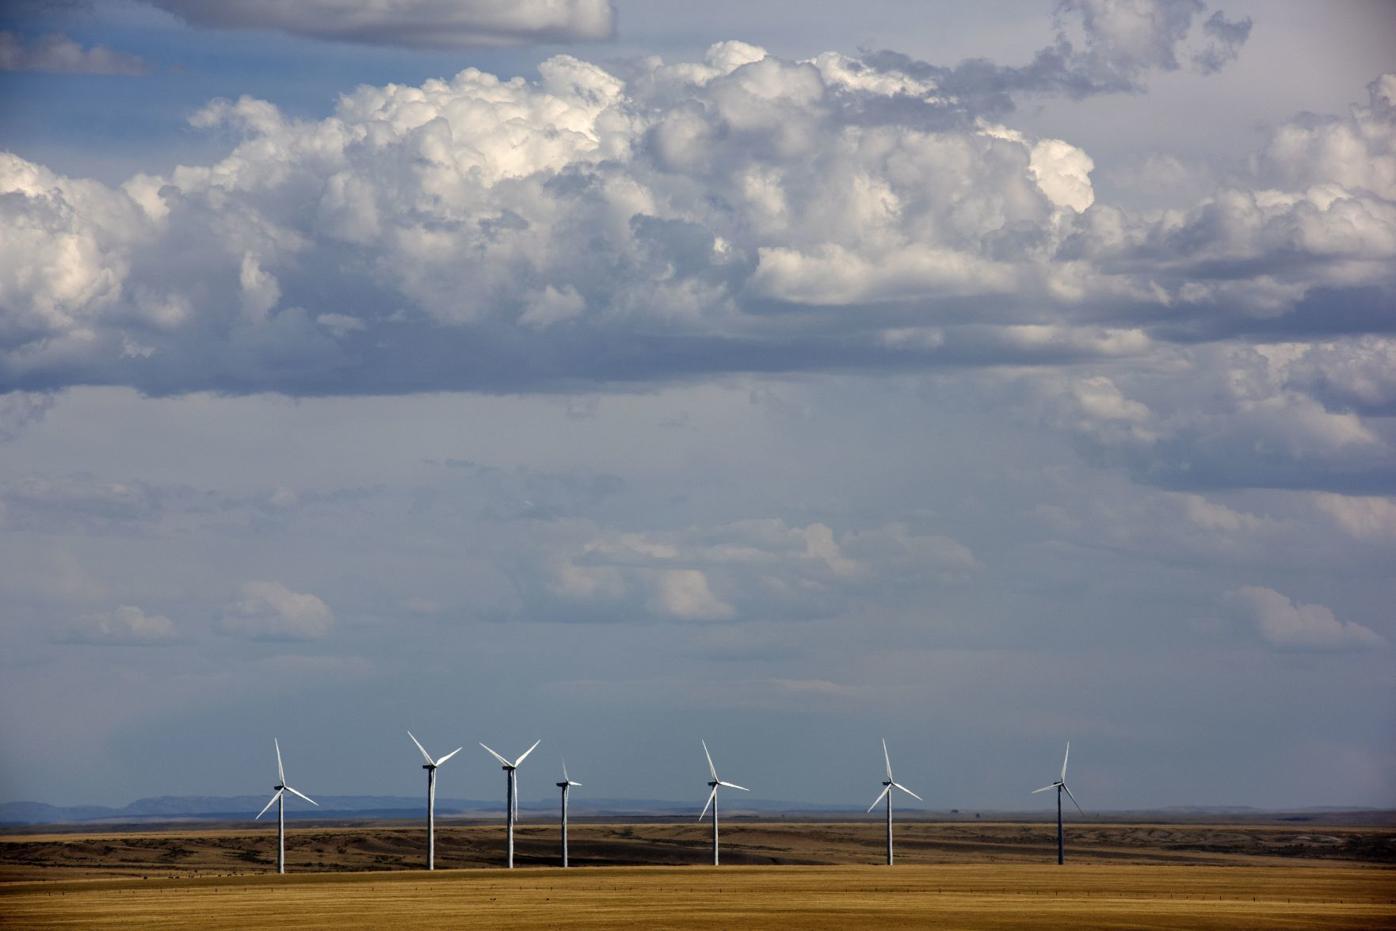 Wind turbines, clouds, near Medicine Bow 2_DSC3142.psd